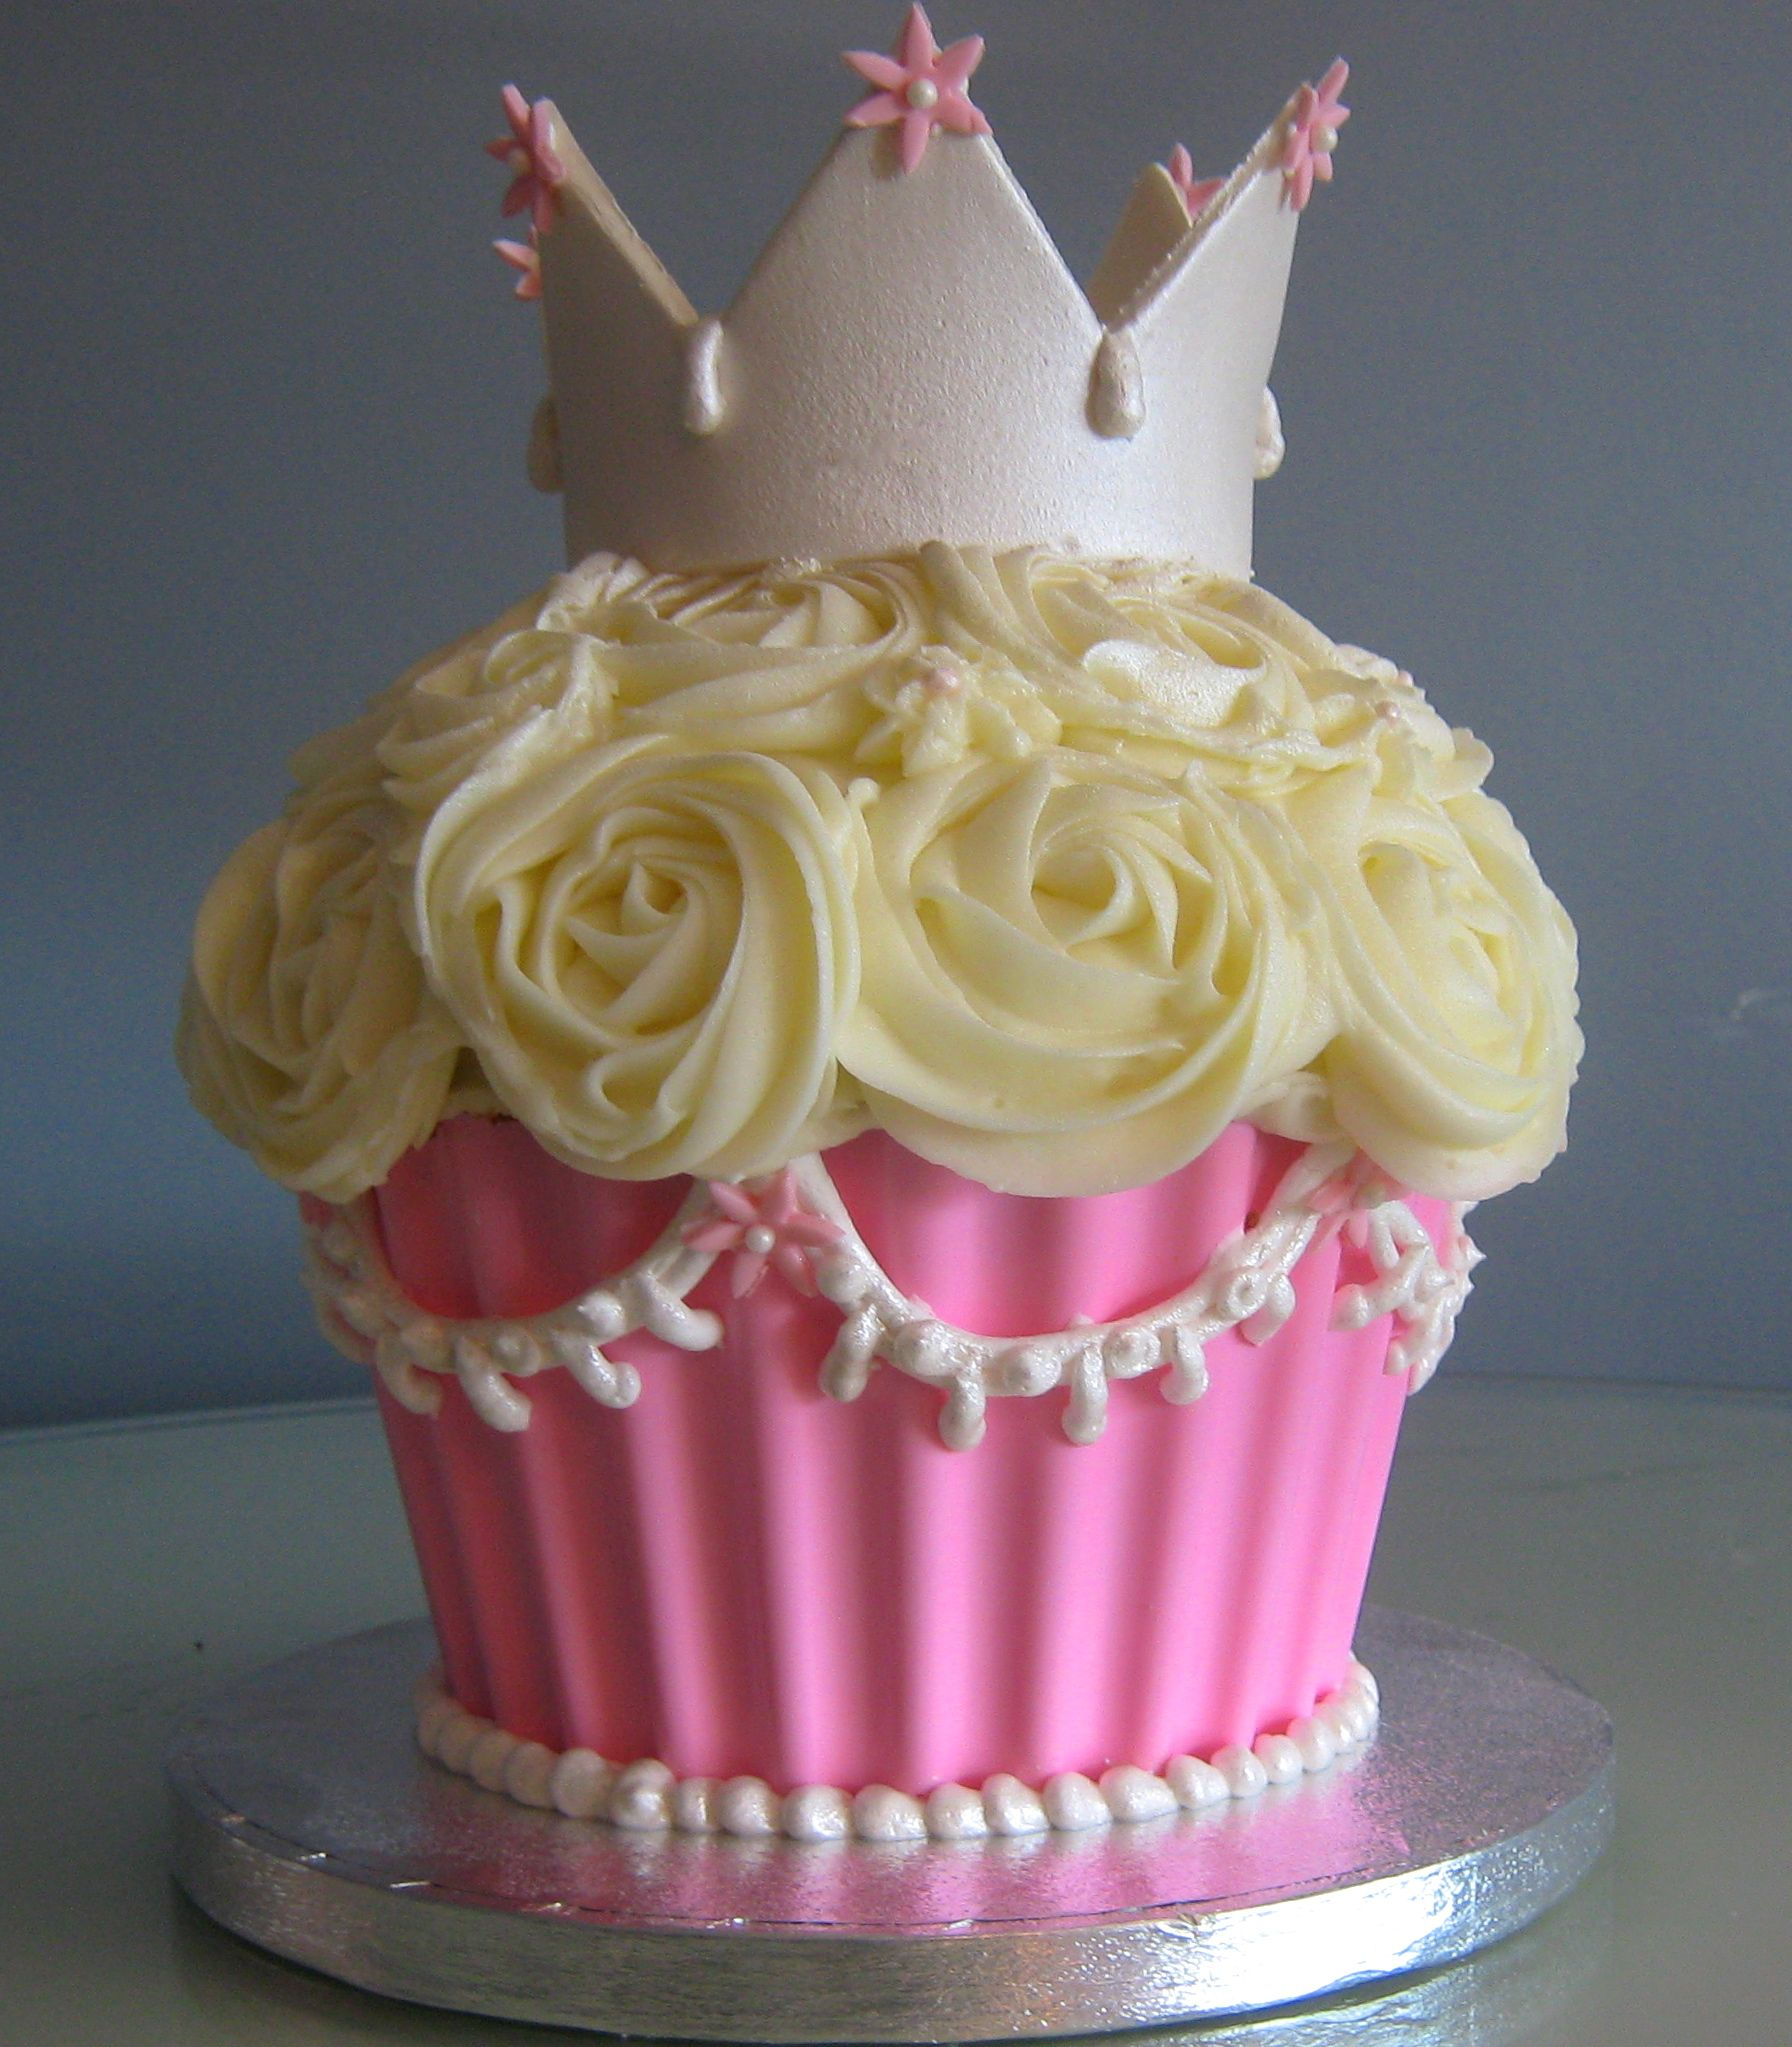 Stupendous Img 4789 Giant Cupcake Cakes Big Cupcake Large Cupcake Cakes Funny Birthday Cards Online Hendilapandamsfinfo